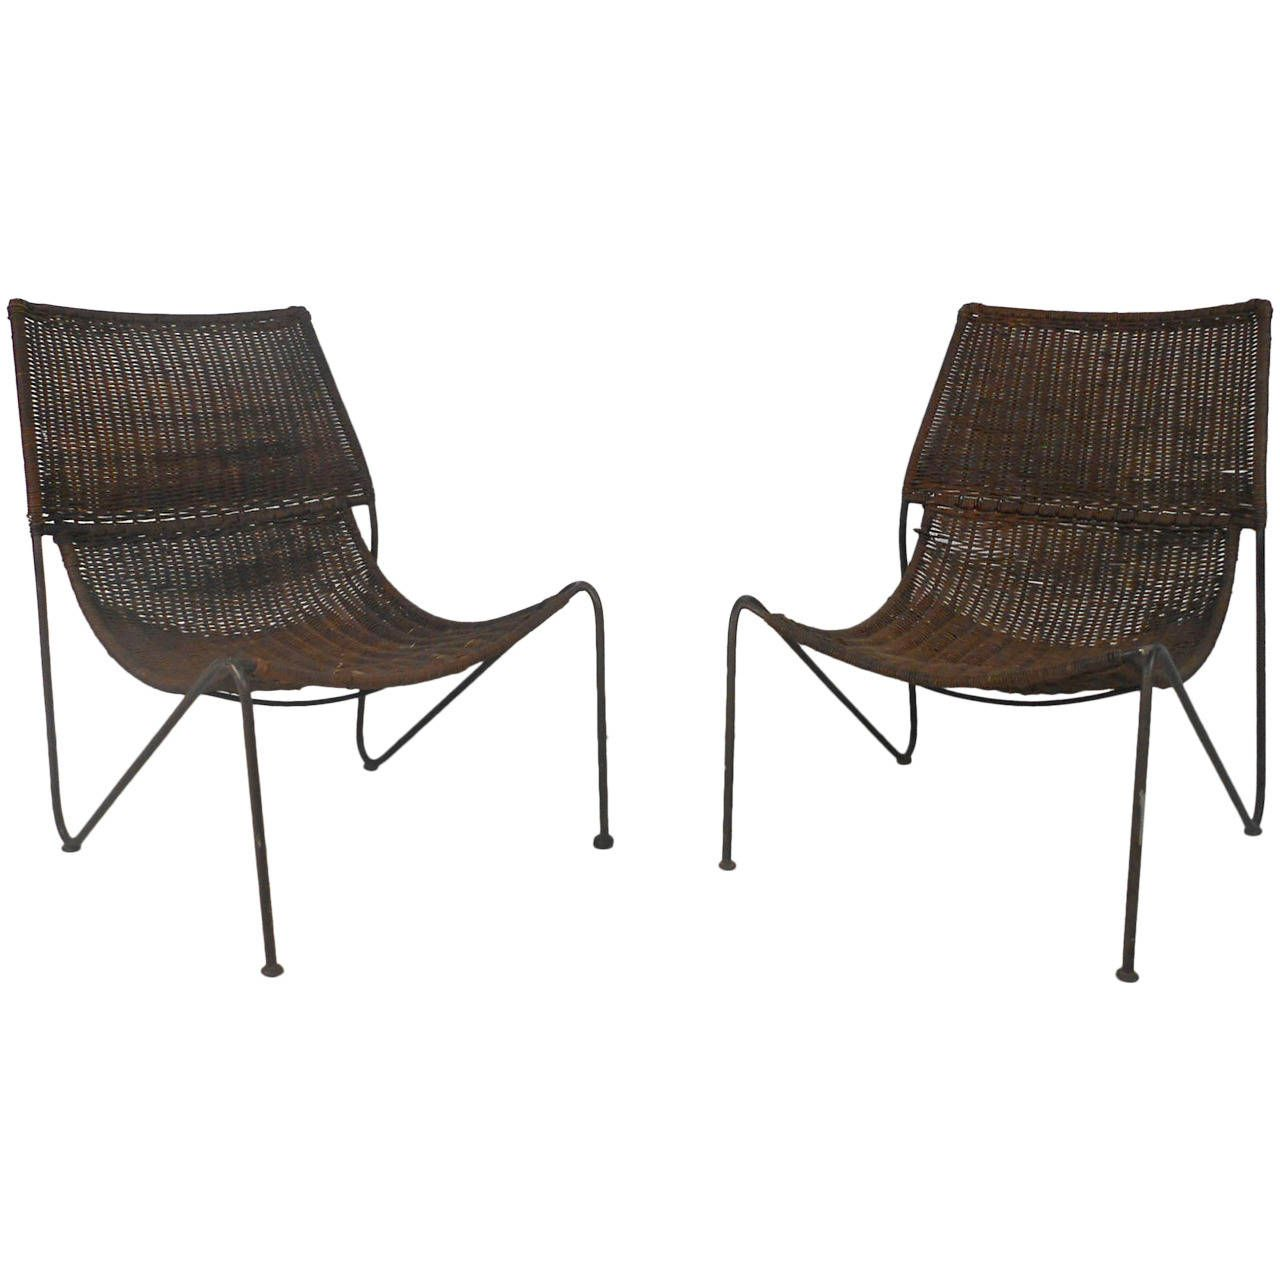 Pair Mid-Century Modern Wicker And Iron Frederick Weinberg ...